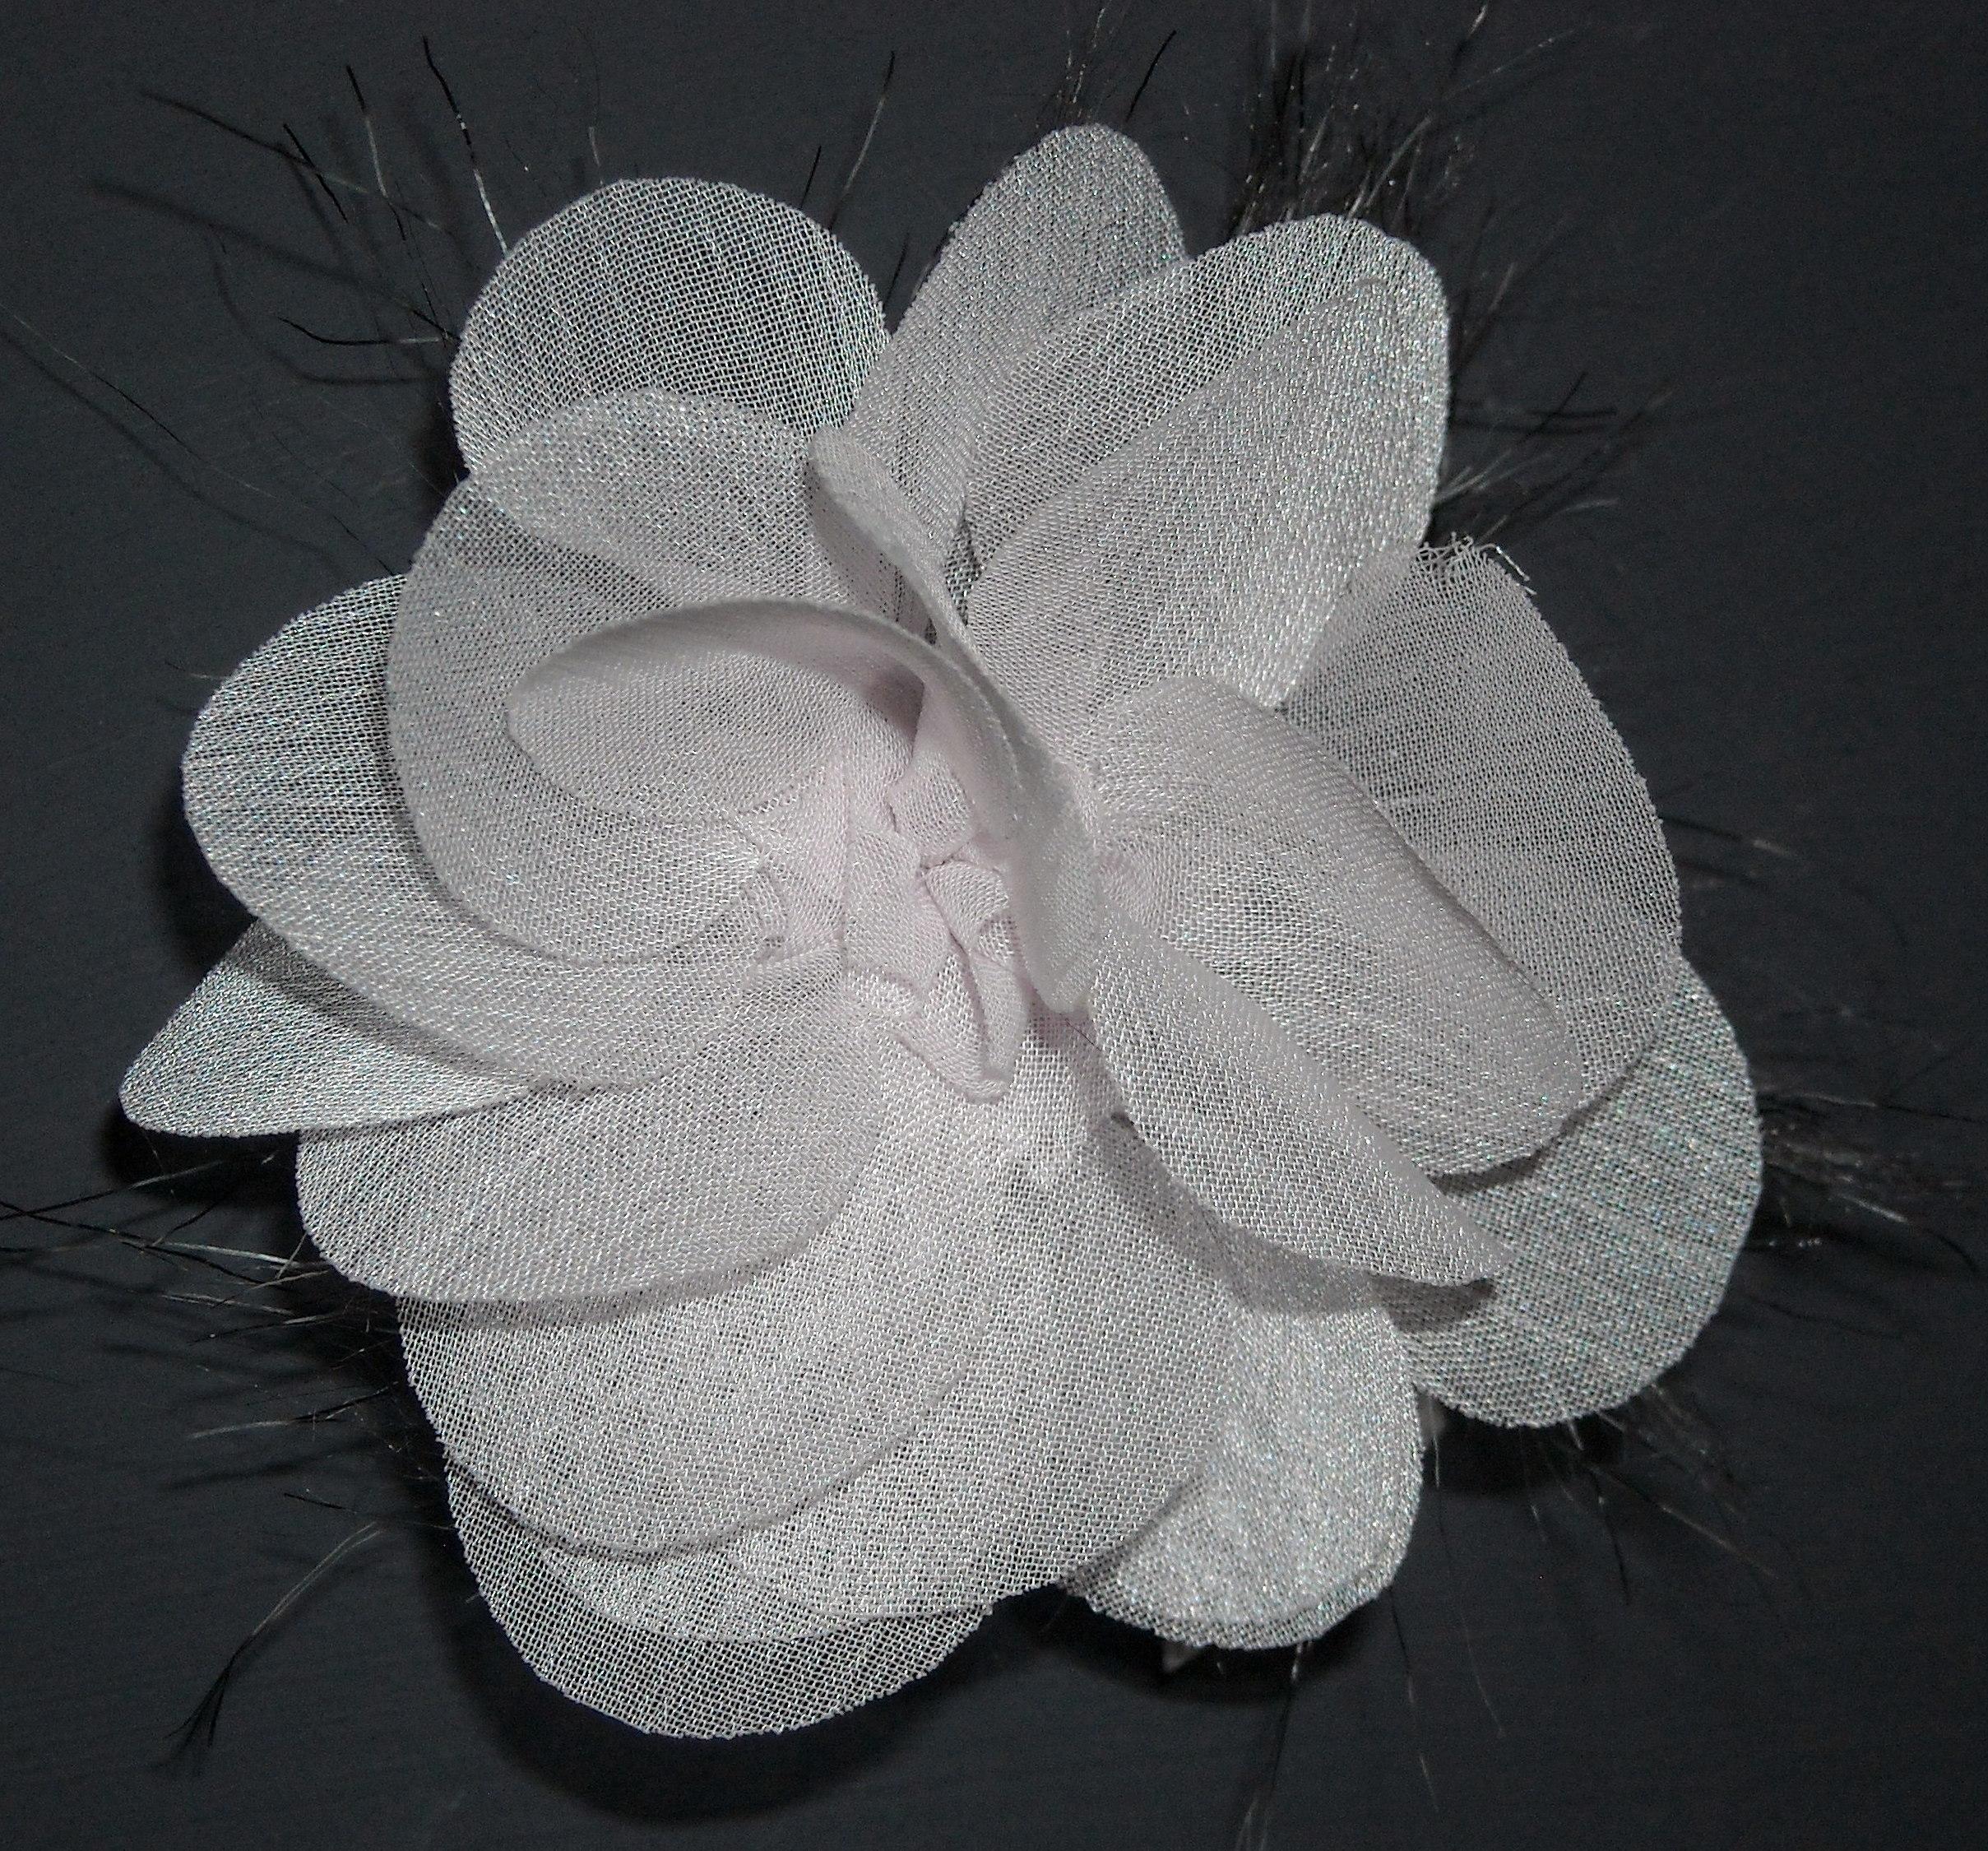 Bijoux textiles voiles (1).JPG